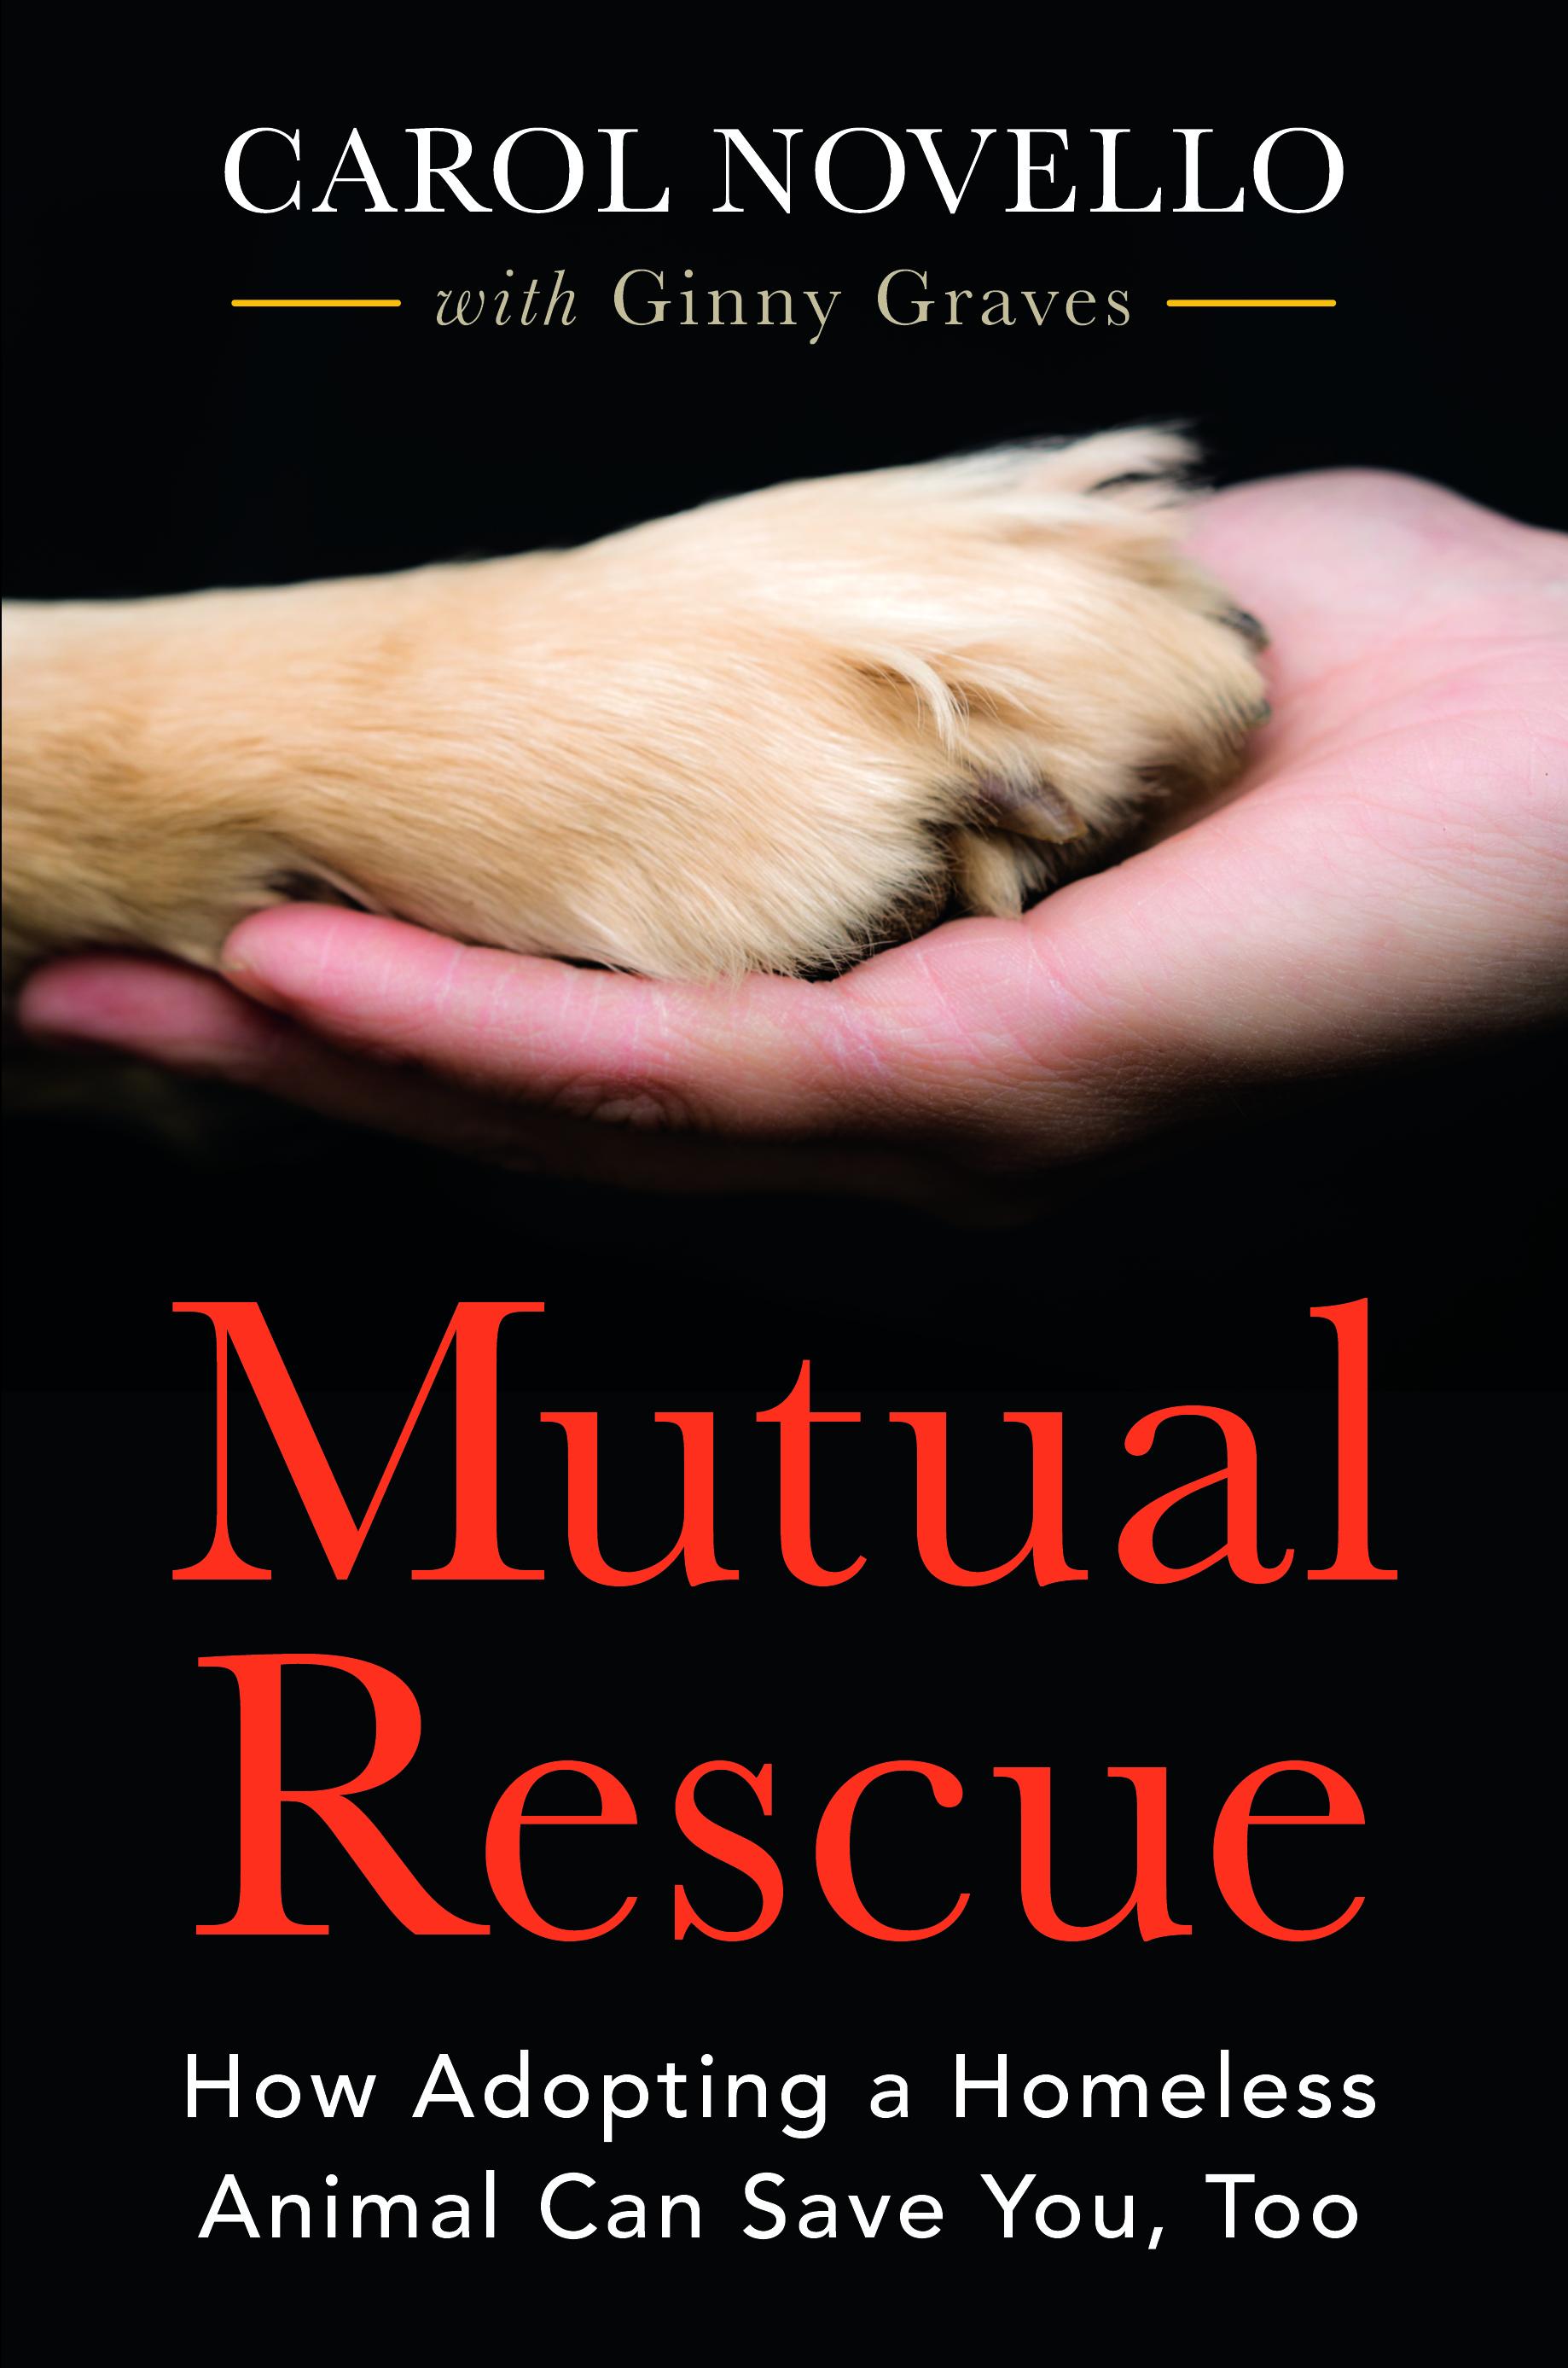 Novello MUTUTAL RESCUE cover.jpg